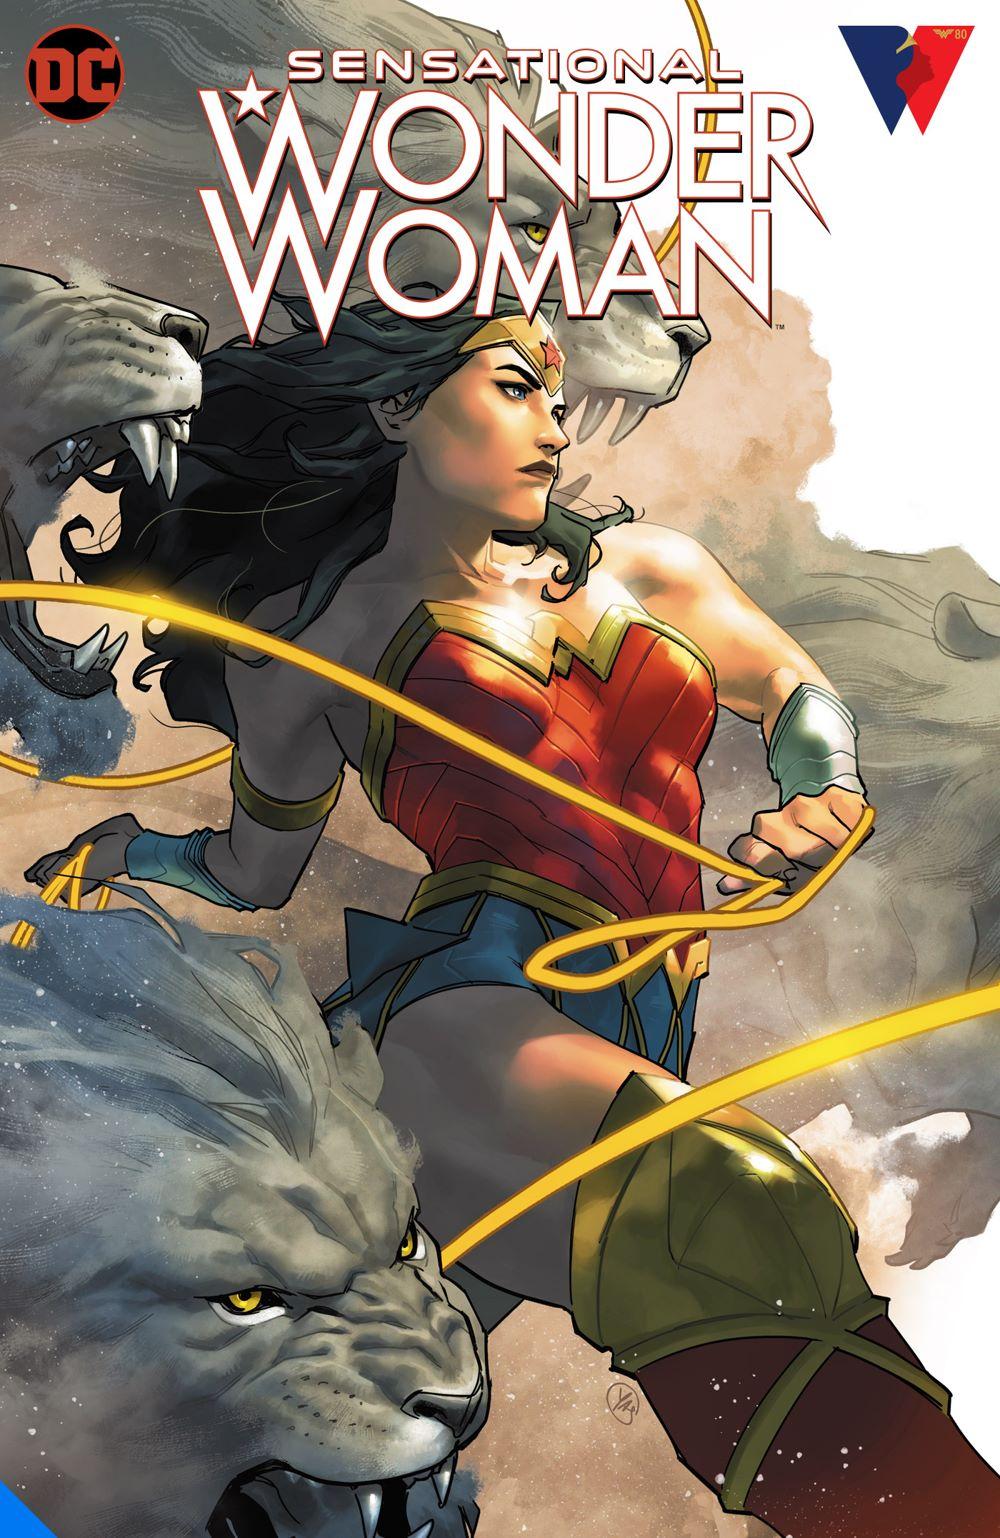 sensationalwonderwoman_adv DC Comics August 2021 Solicitations